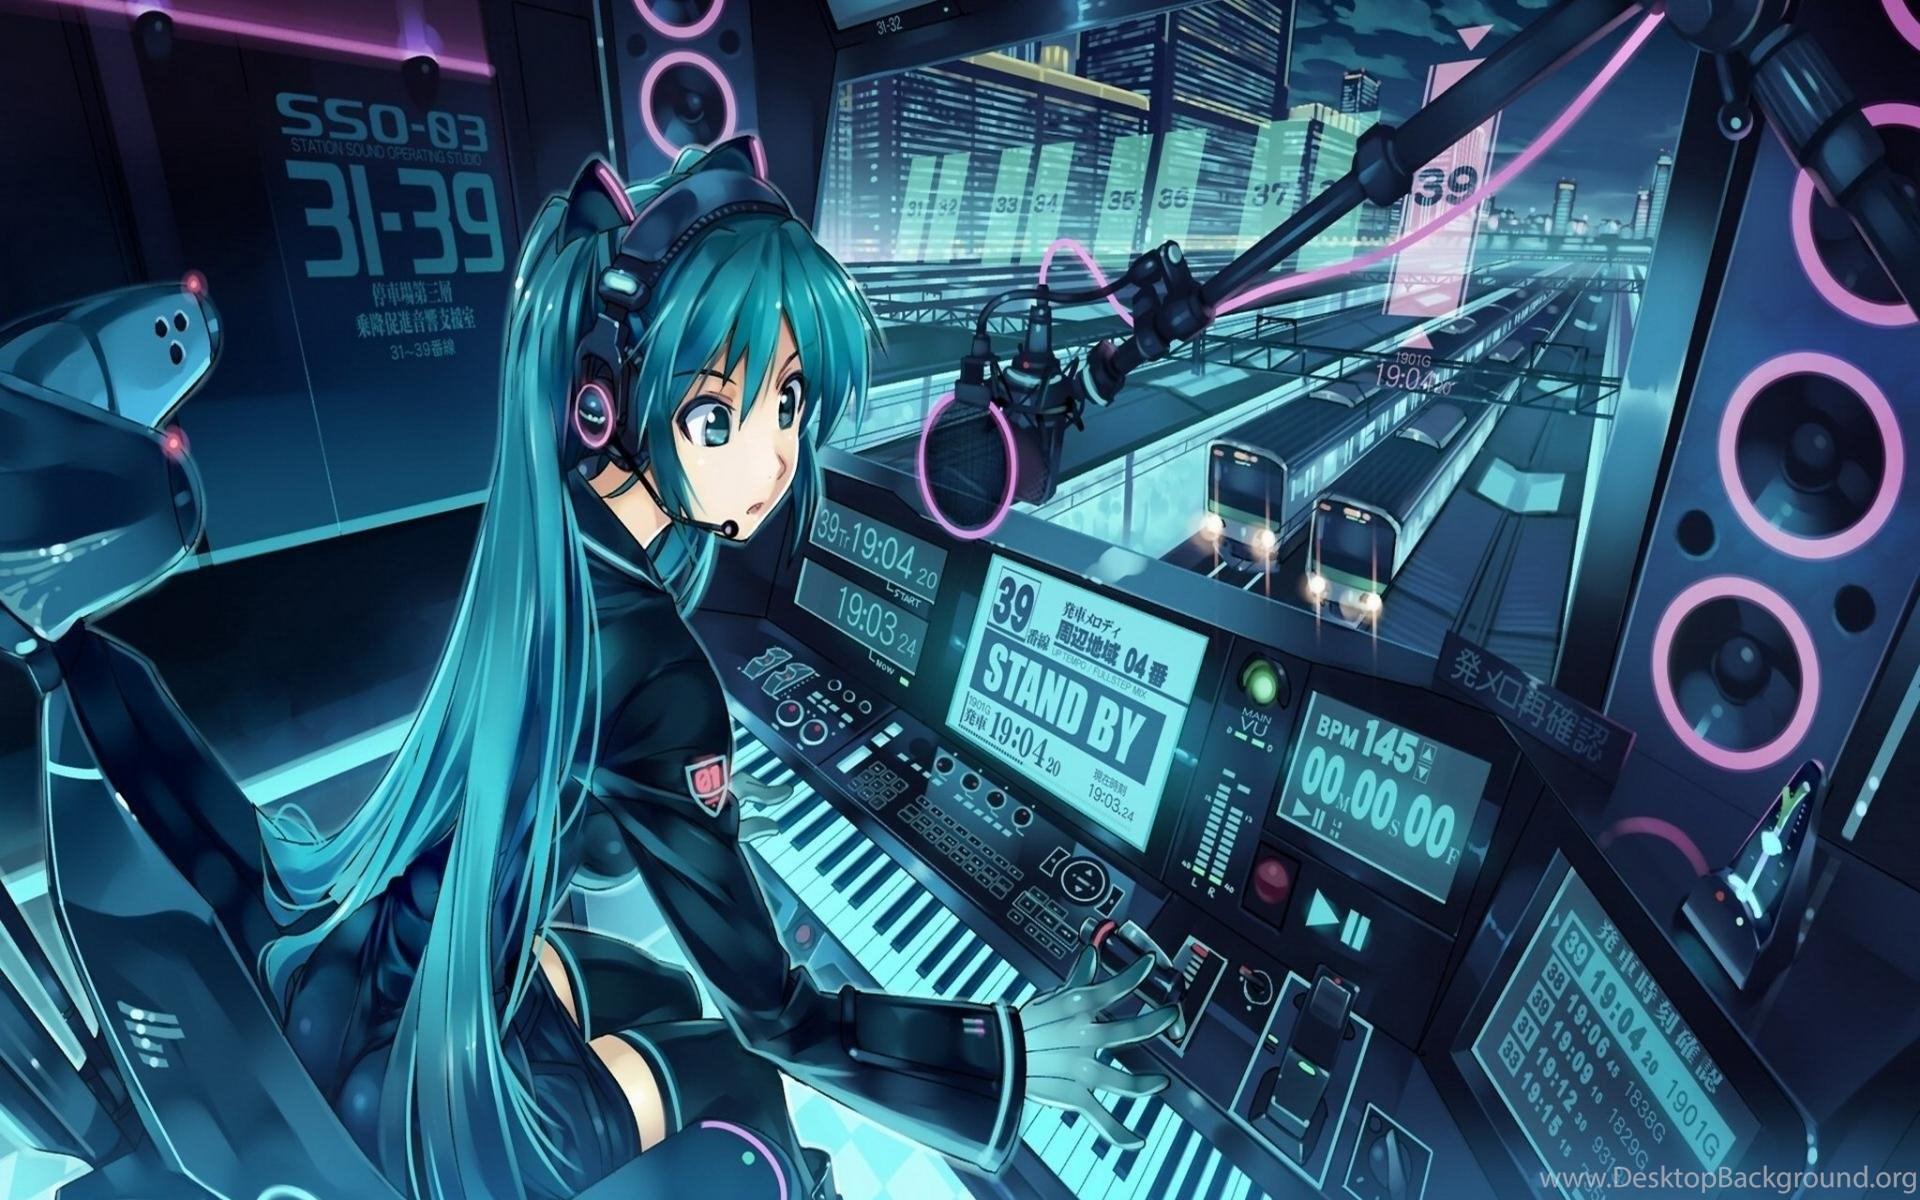 Anime New Ipad Wallpaper Backgrounds 26 Photos Desktop Background